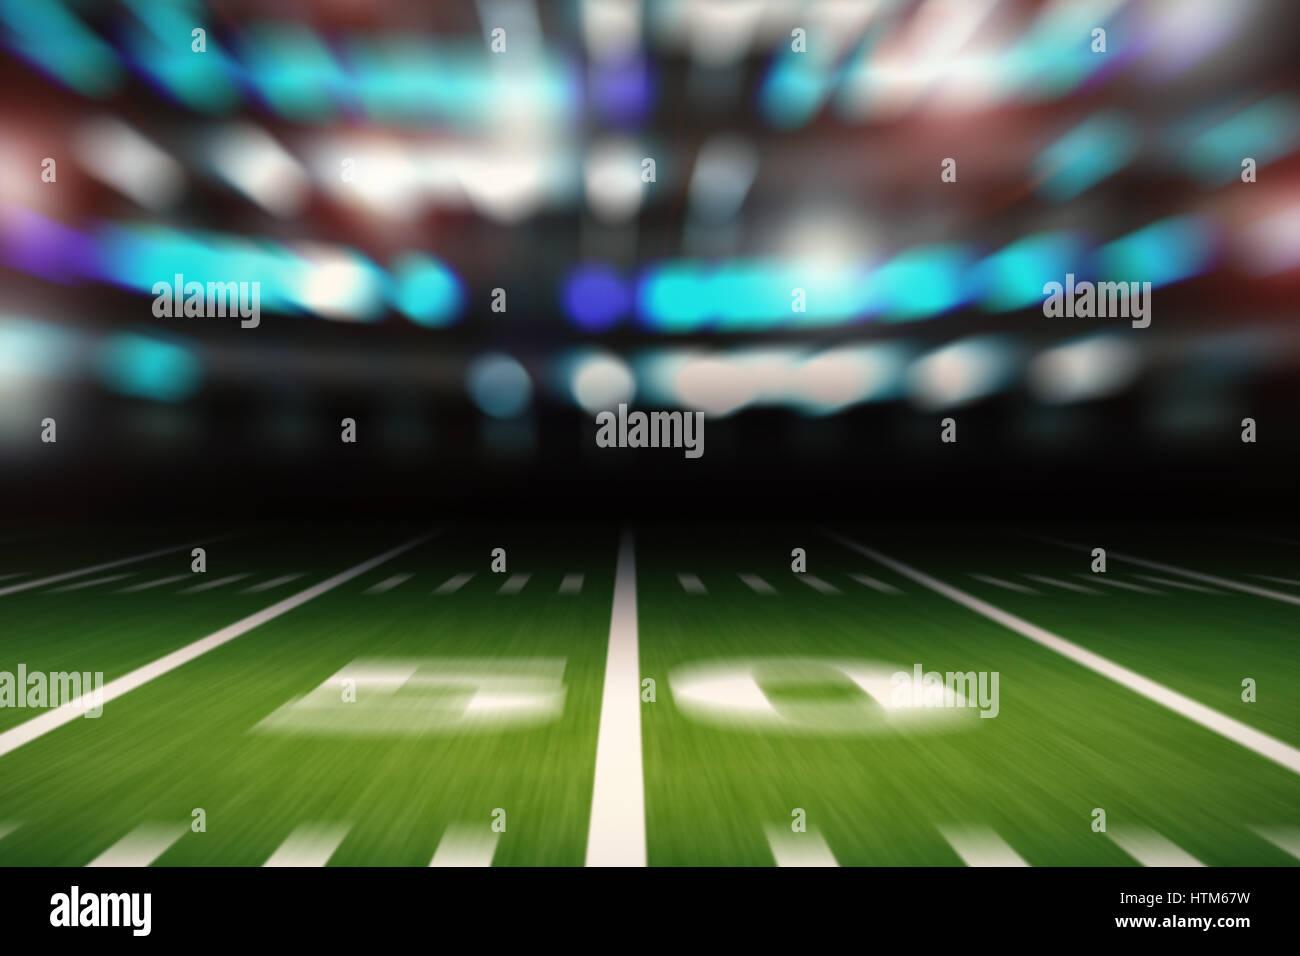 3d rendering empty american football stadium blurred background - Stock Image